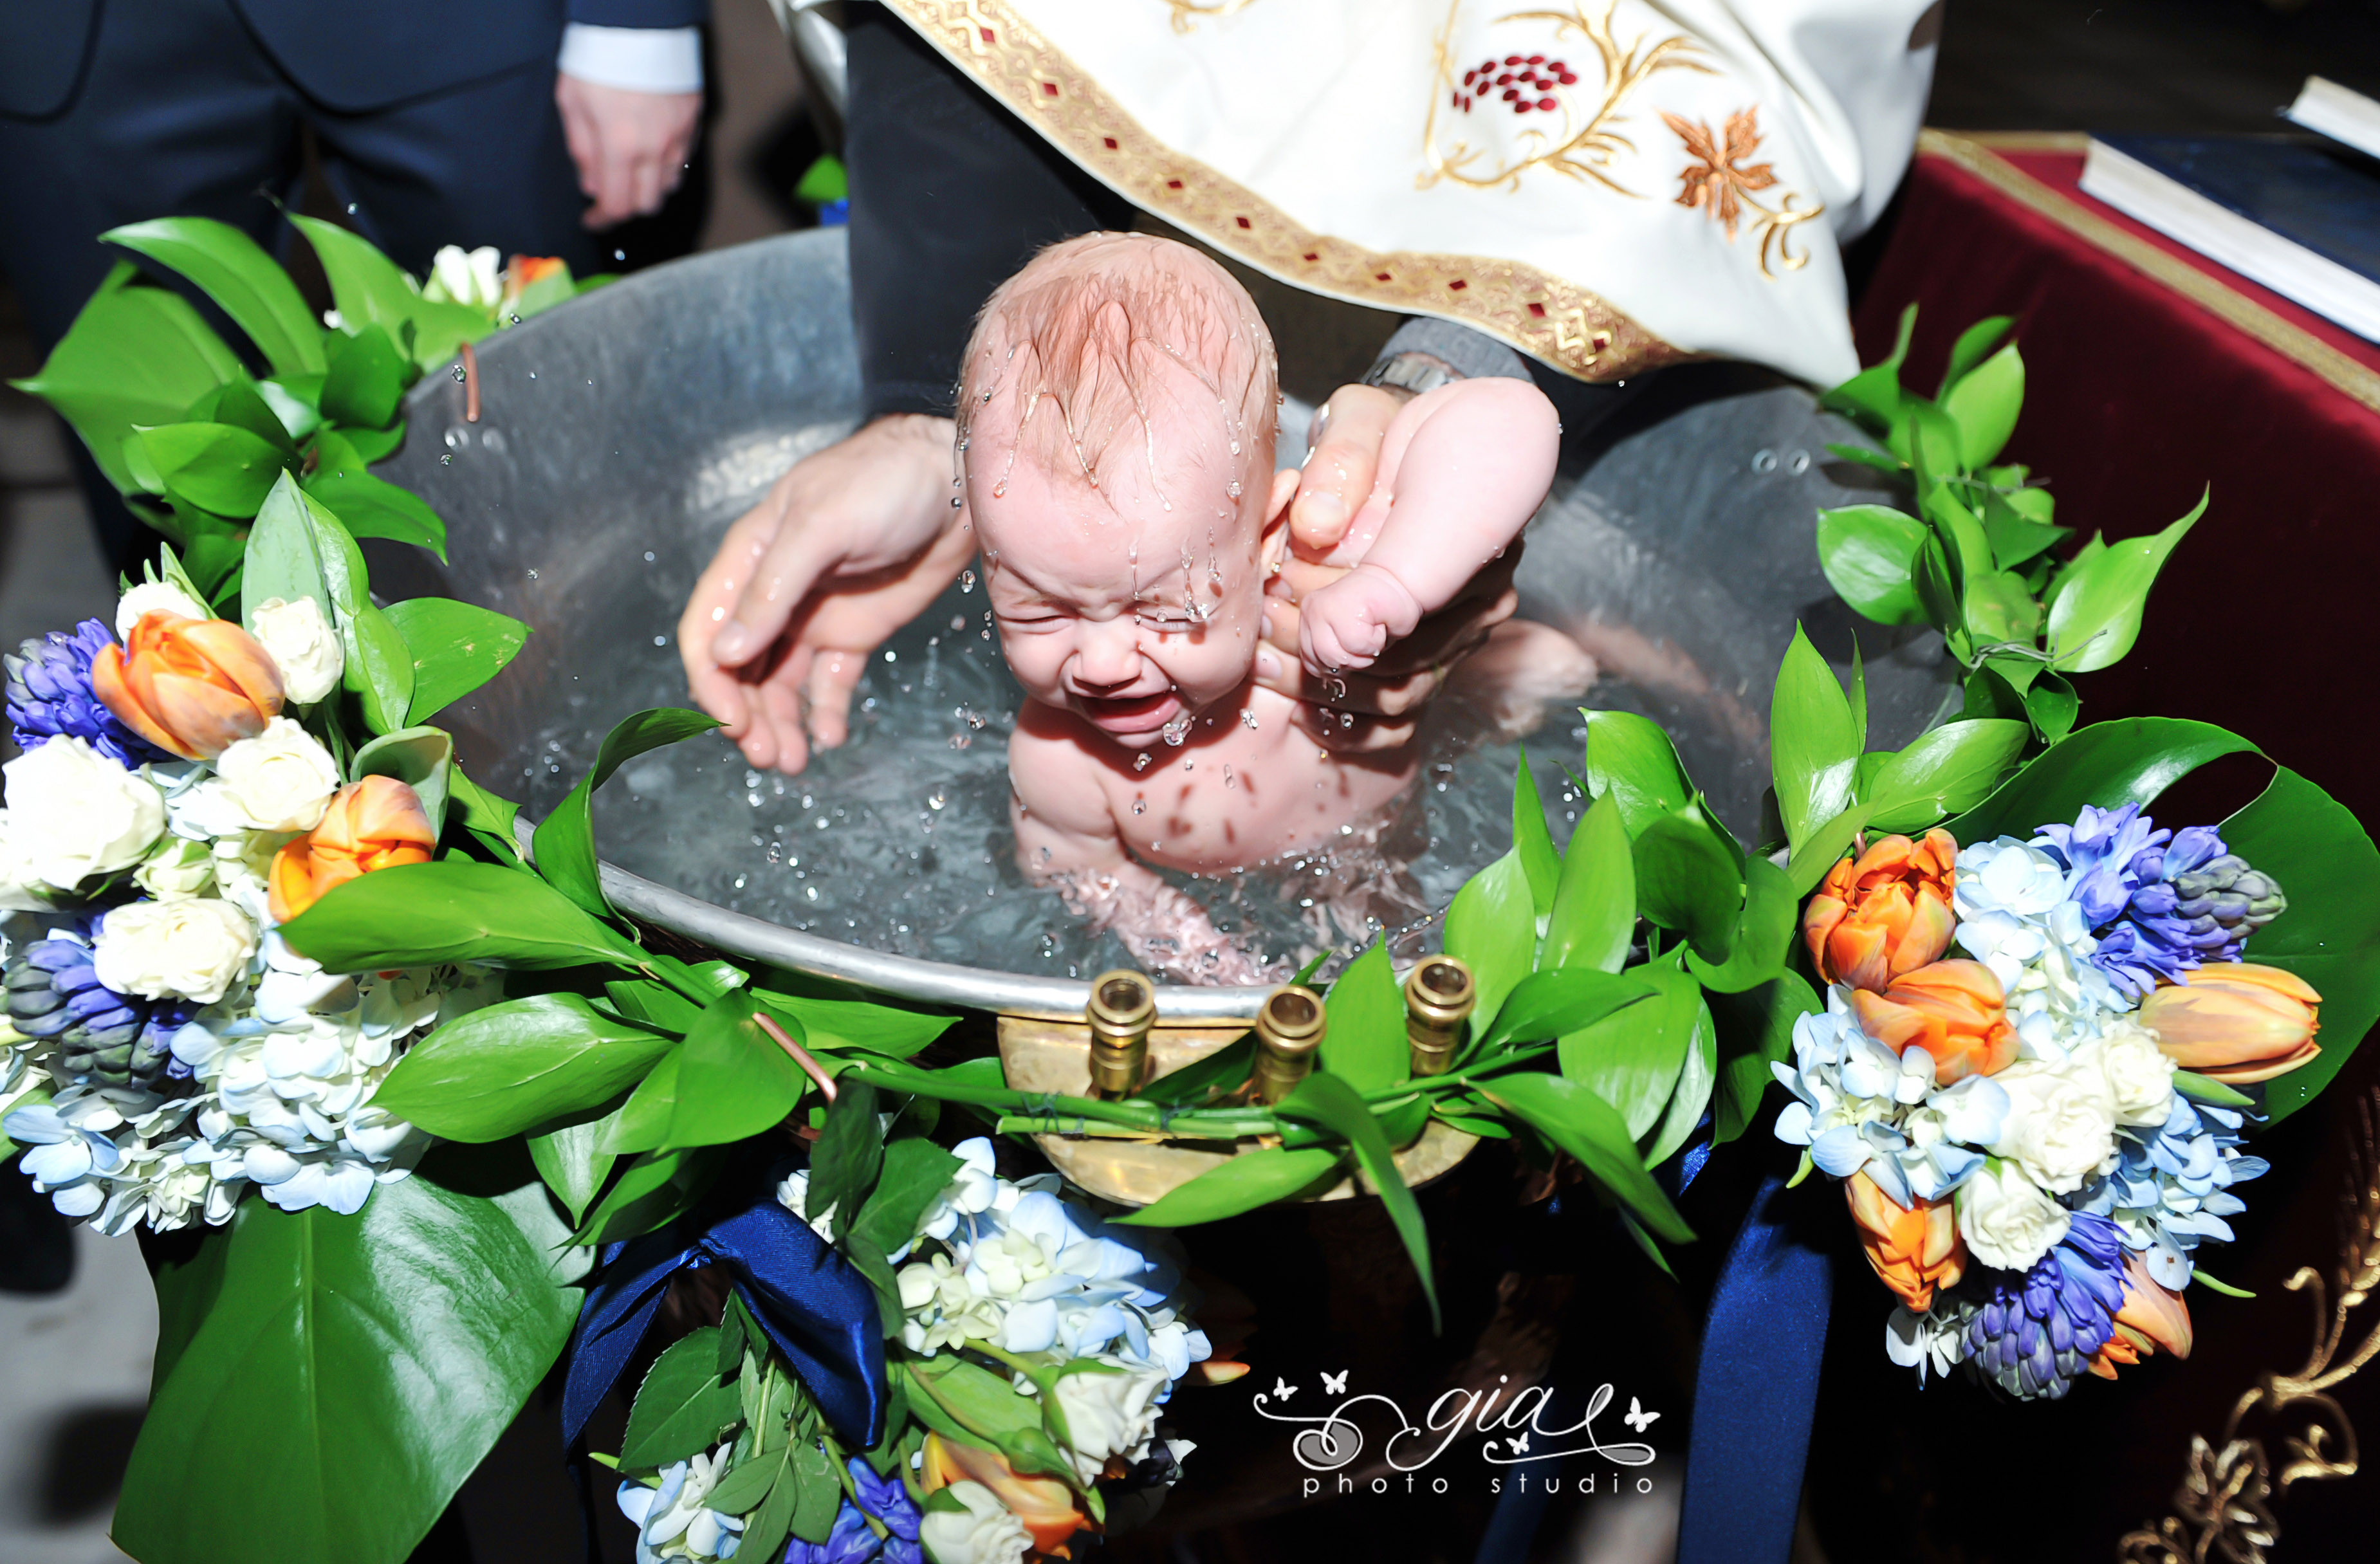 Poze profesioniste pentru botez – GIA STUDIO